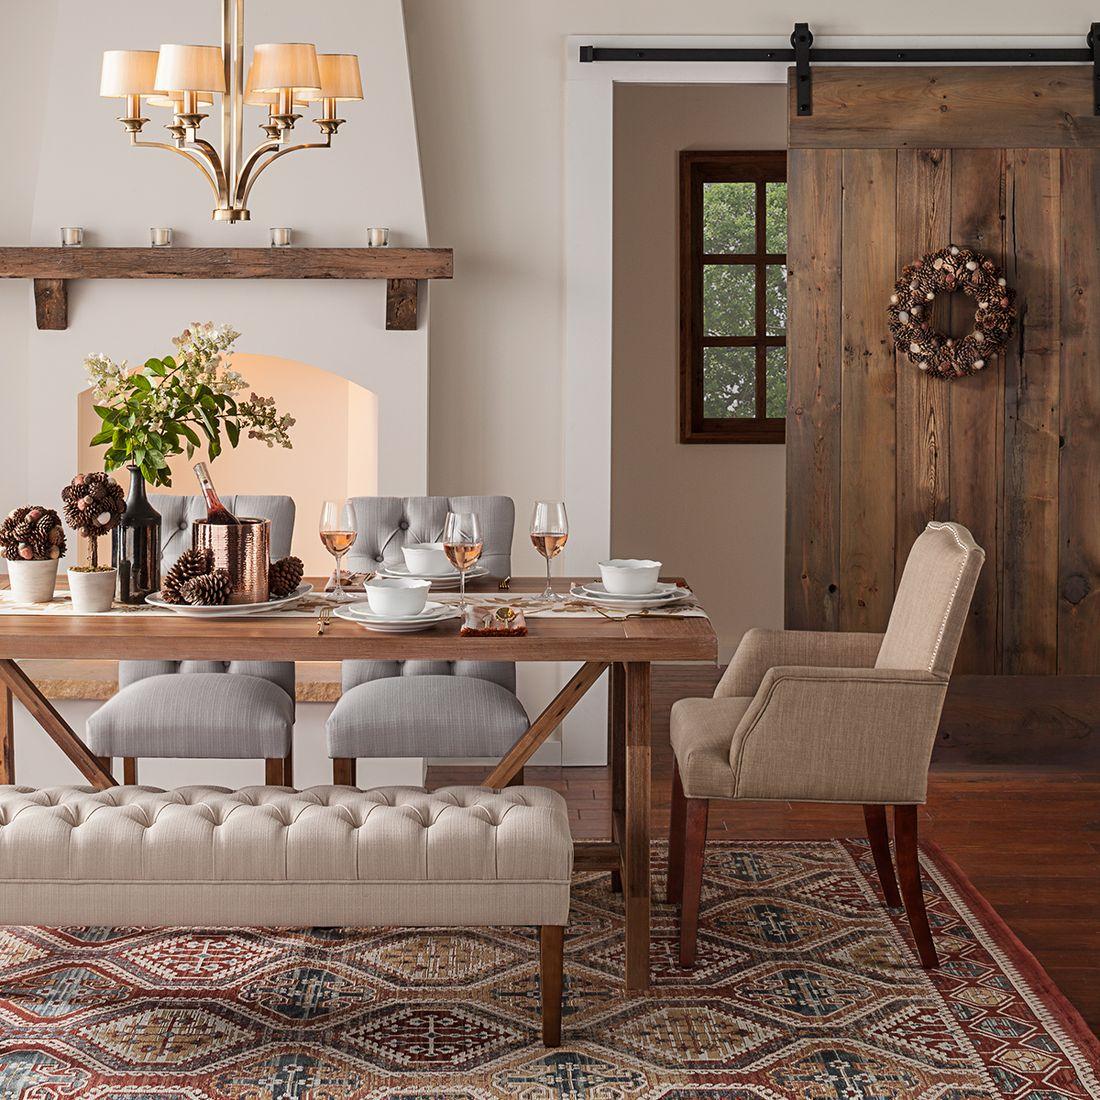 Home Ideas, Design & Inspiration : Target